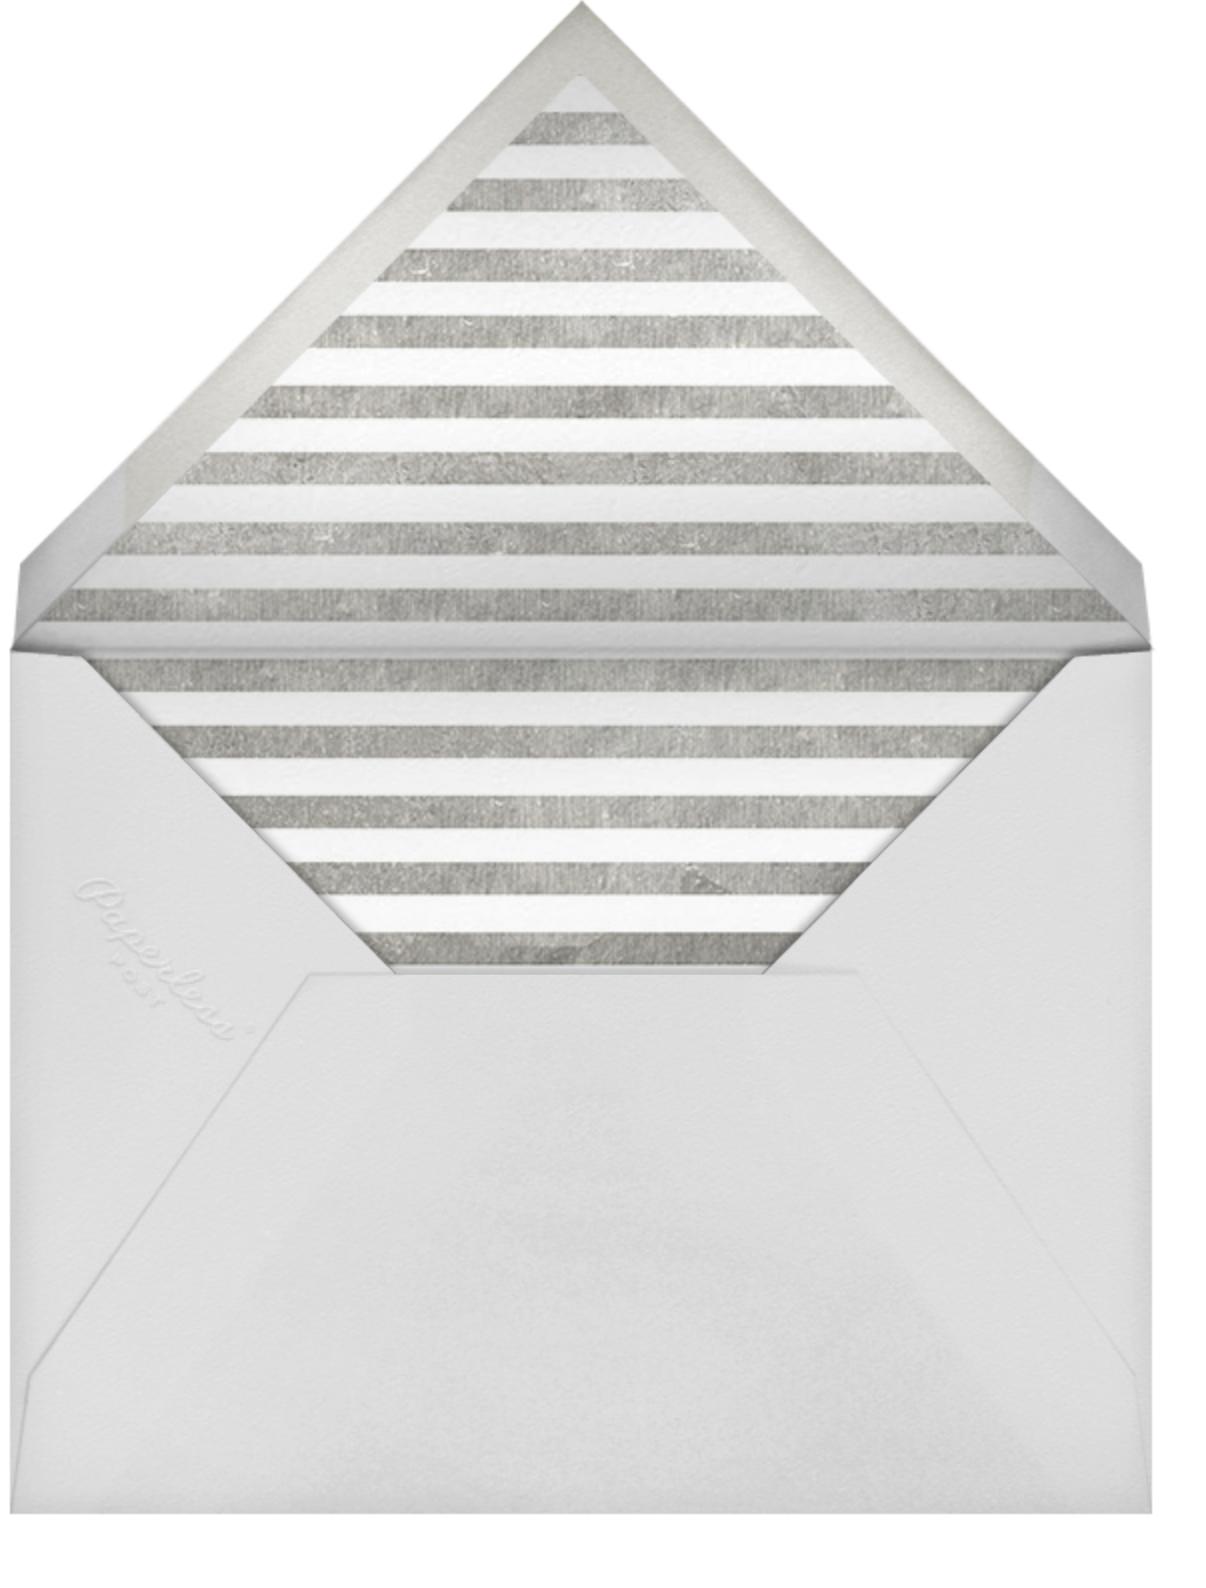 Evergreen Stripes - Silver/White - kate spade new york - Adult birthday - envelope back